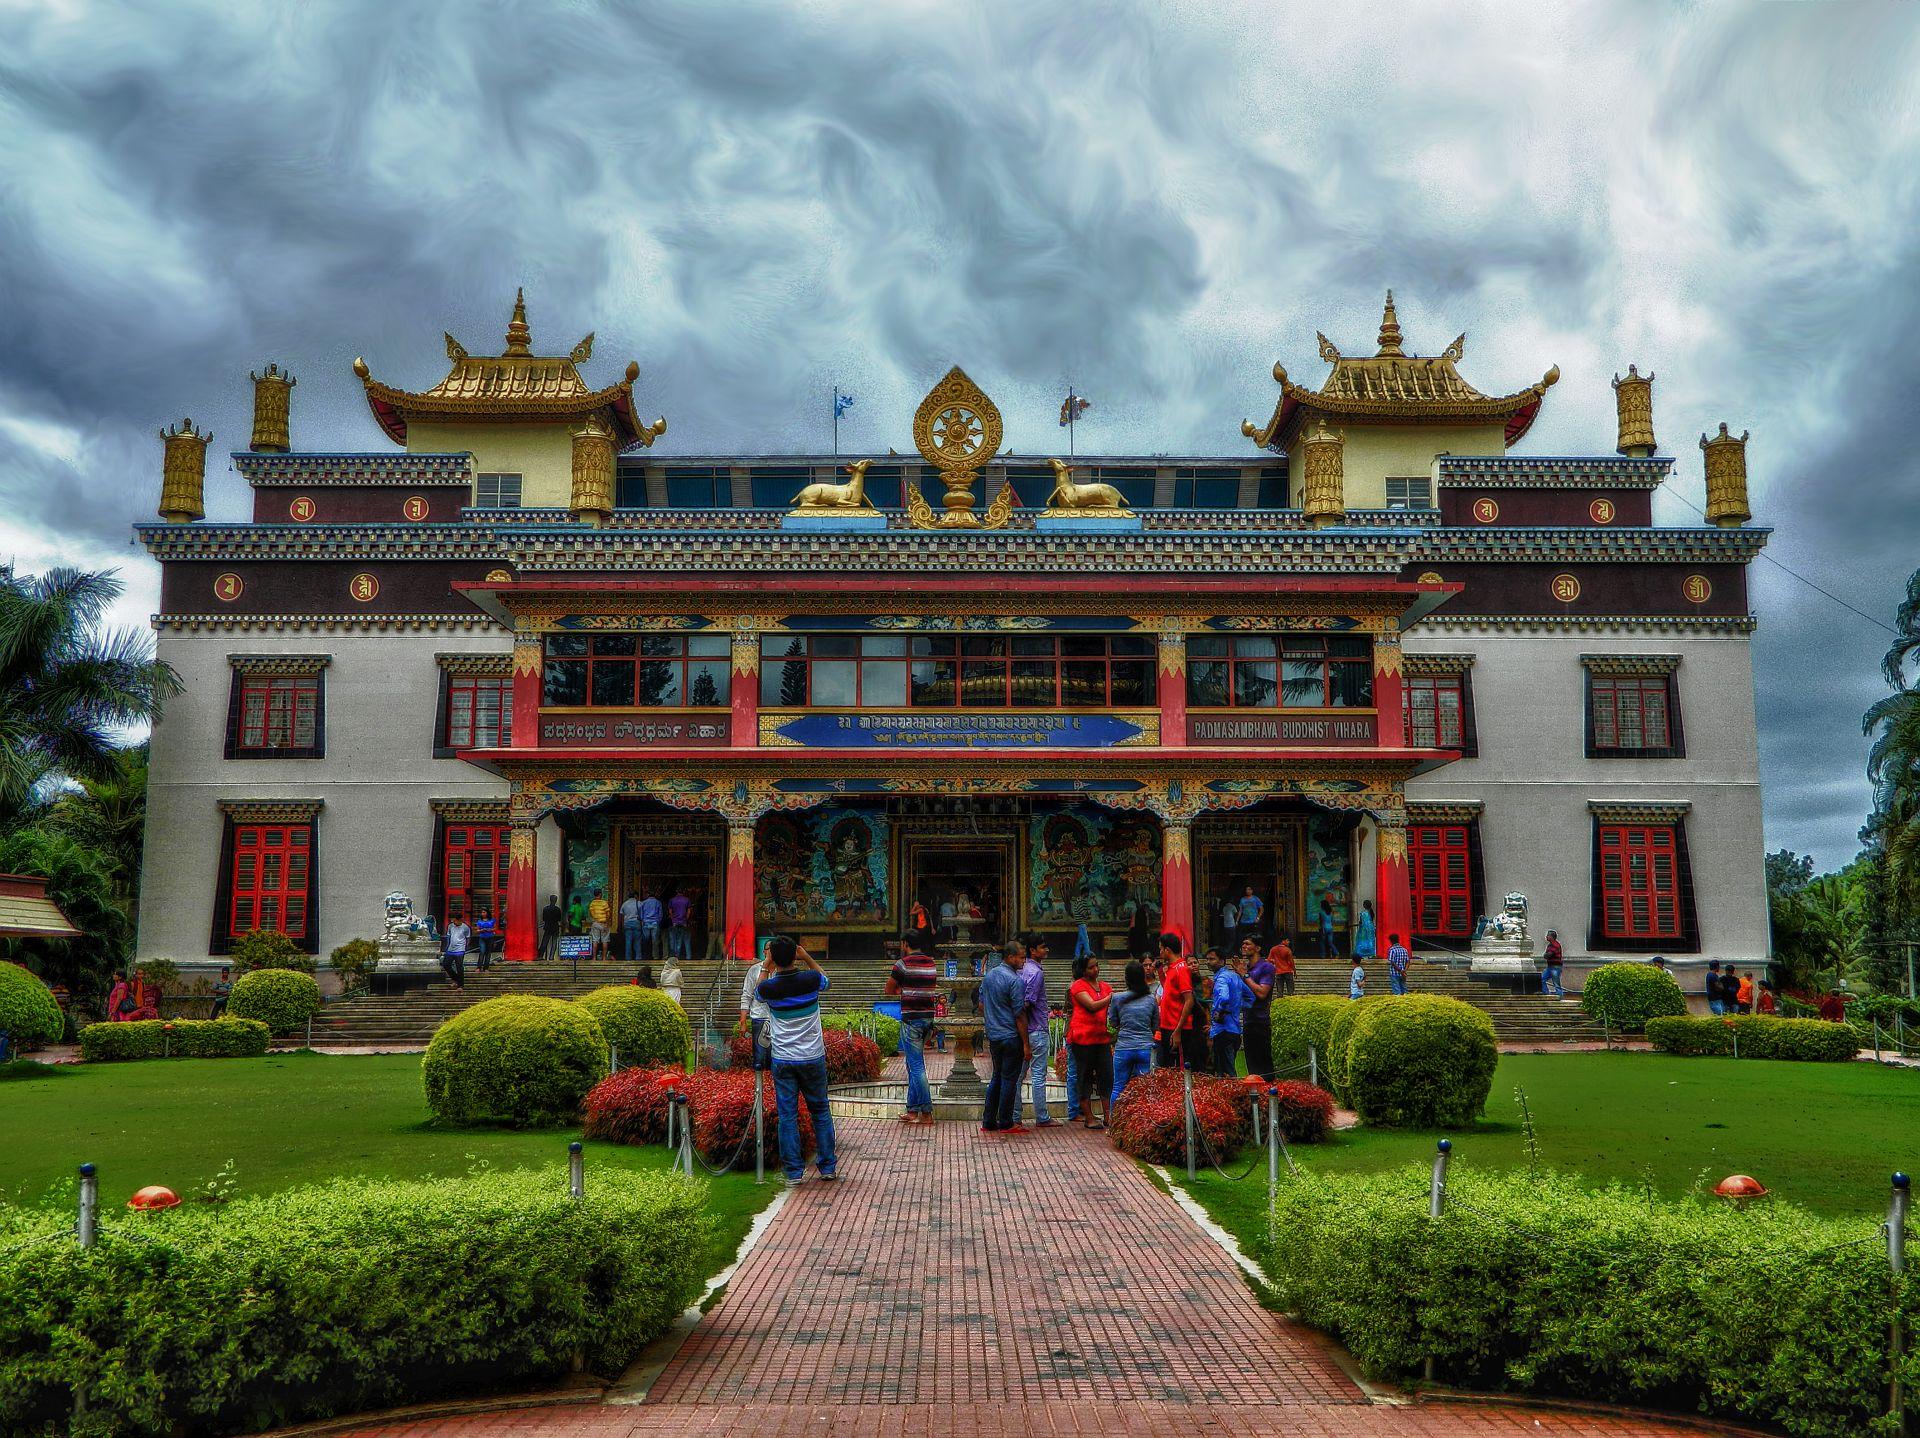 bylakuppe, buddhist monastery, irfan, hussain, thereddotman, the red dot man., HDR, High dynamic range, Nikon L120, Nik HDR EFEX